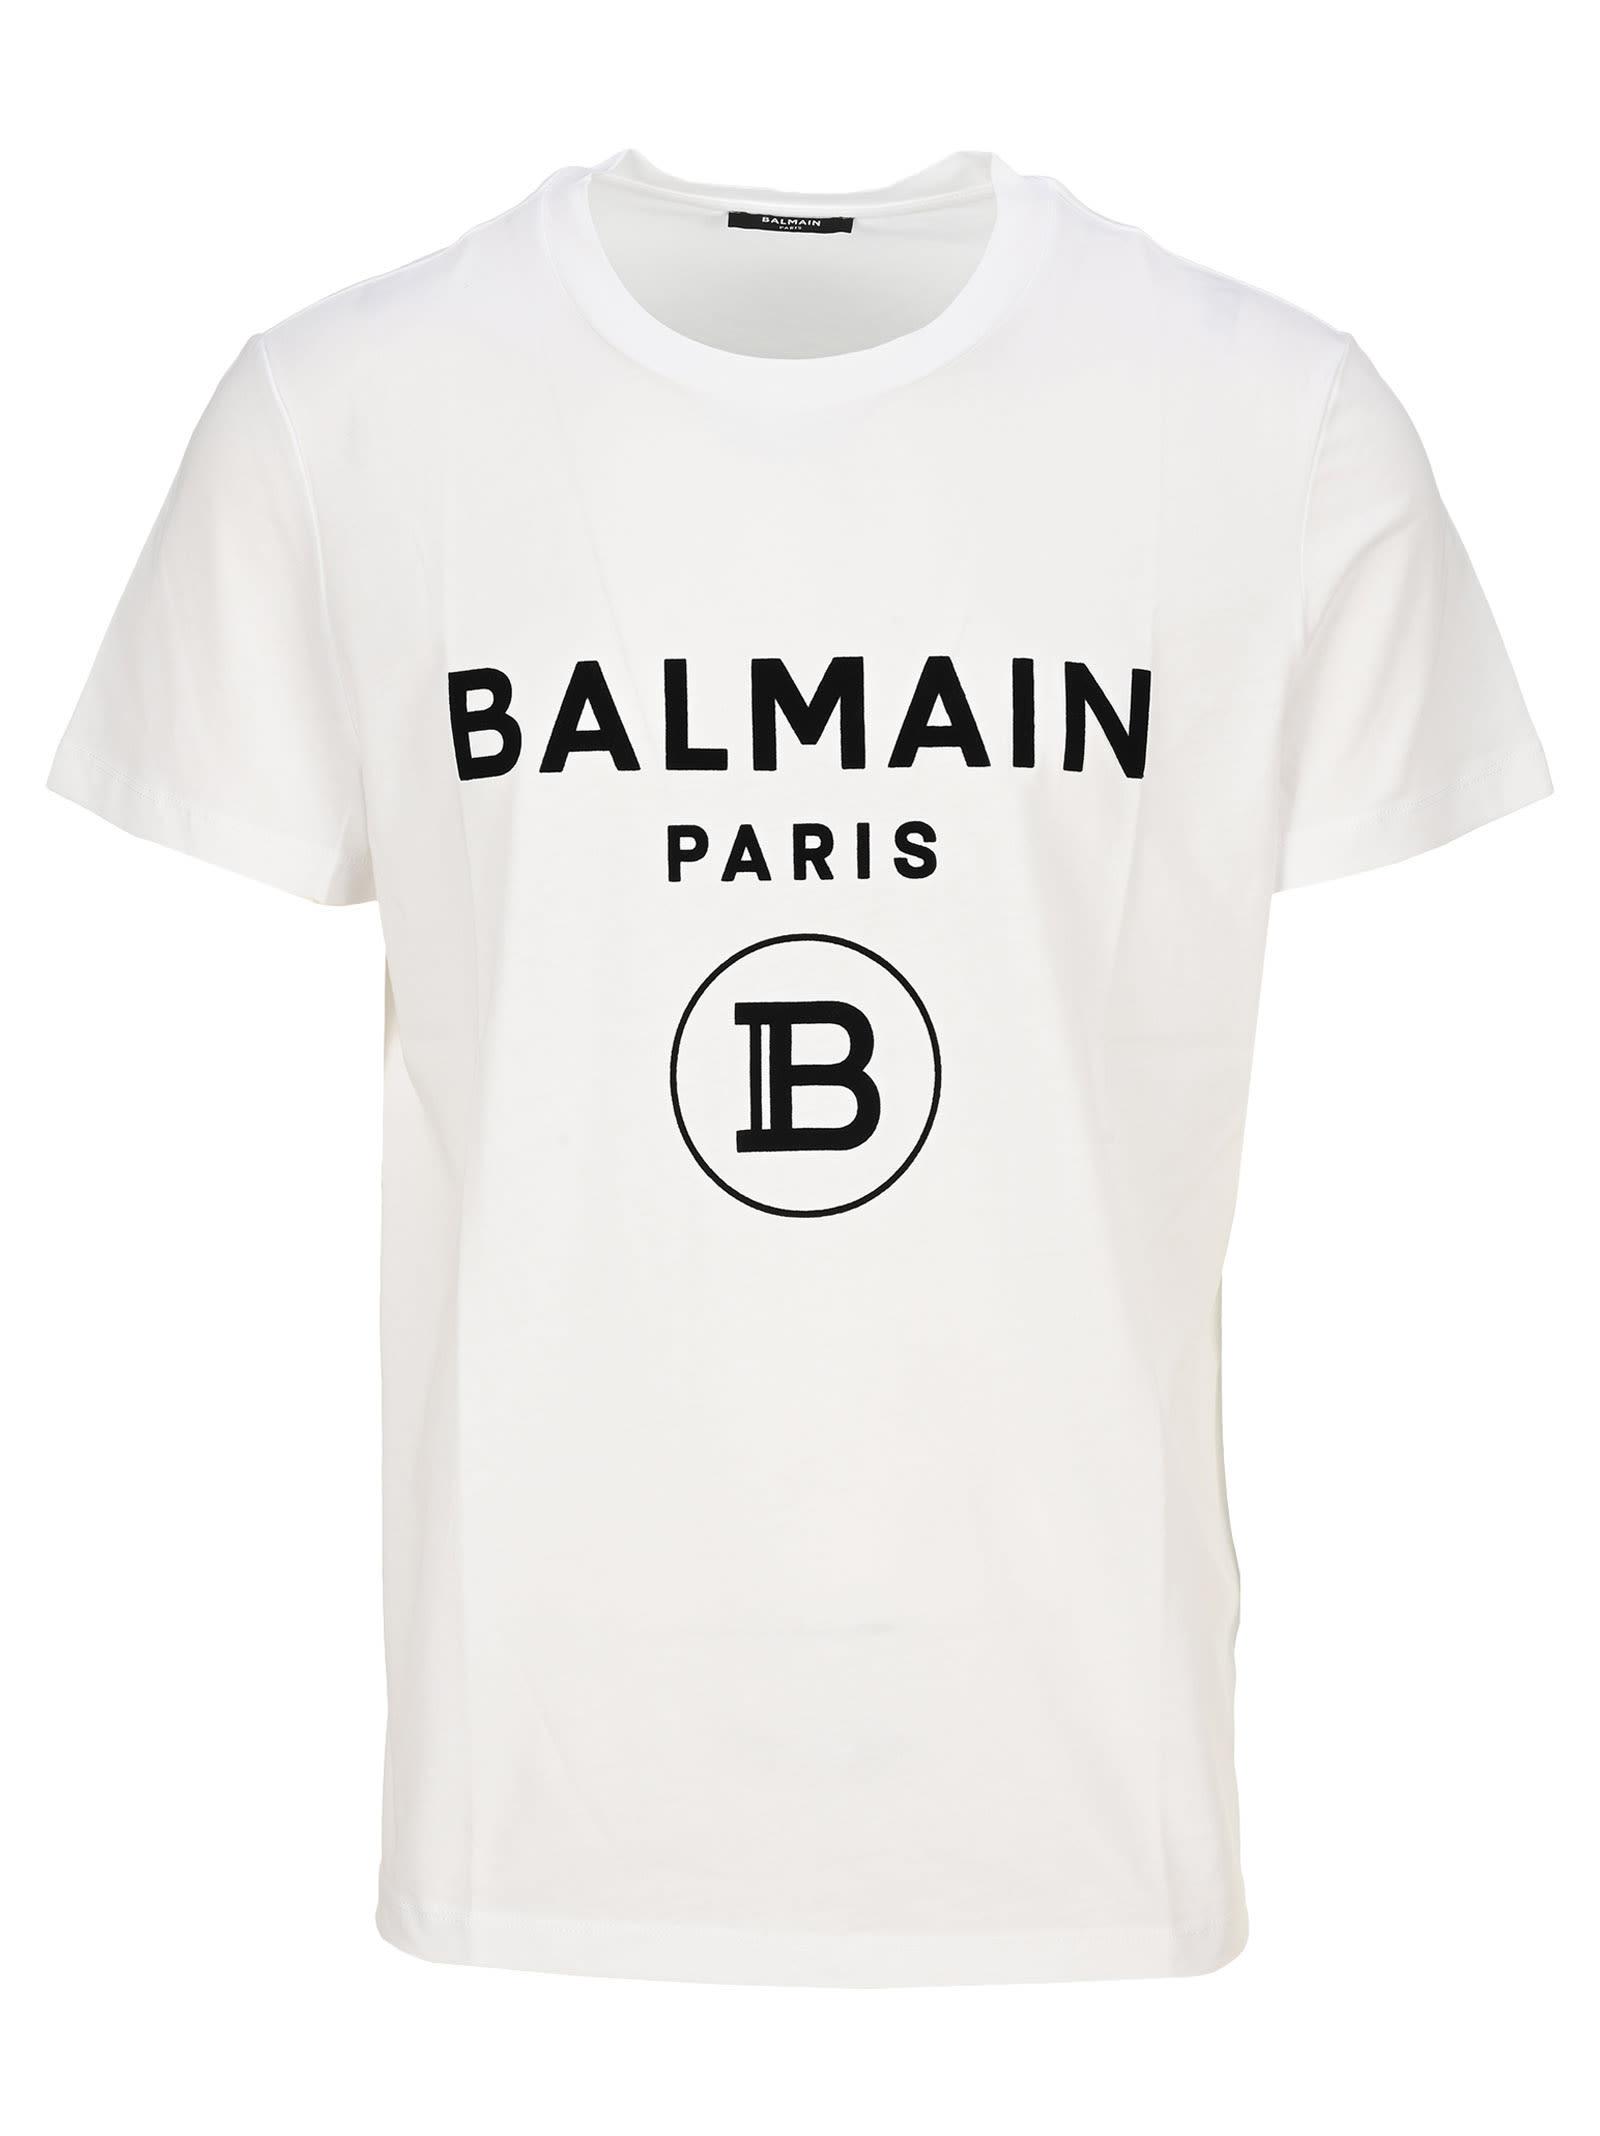 Balmain Cottons T-SHIRT FLOCK